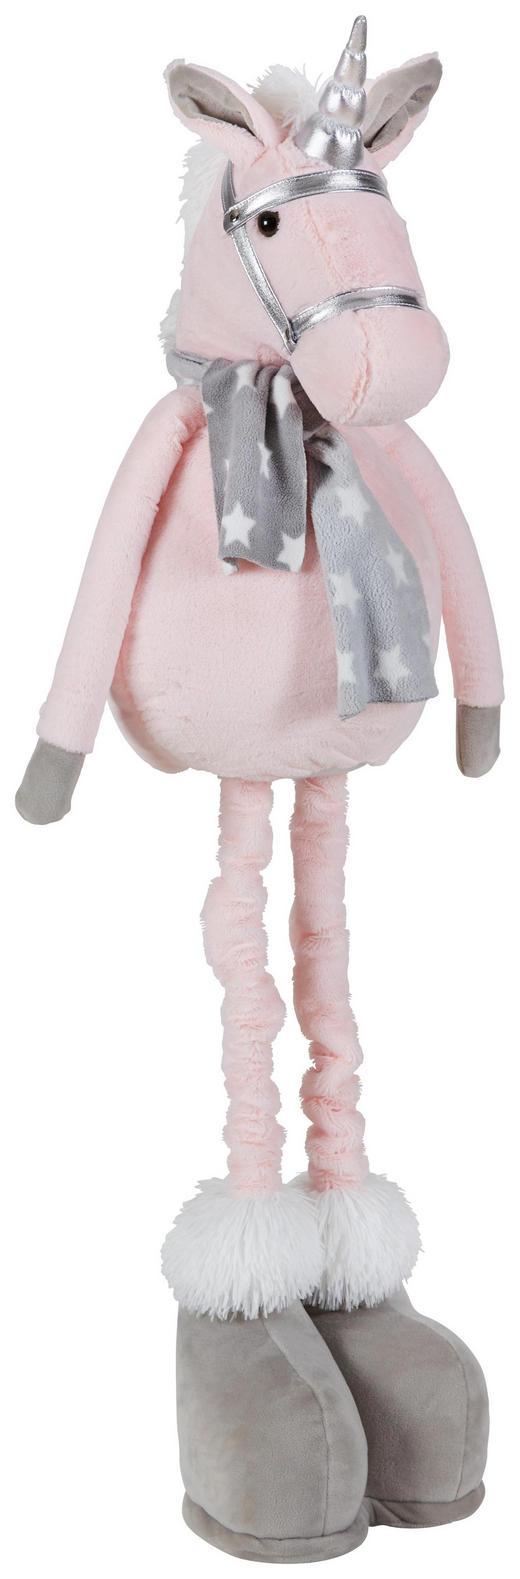 SPIELZEUGFIGUR - Rosa, Basics, Textil (60-80cm) - Ben'n'jen